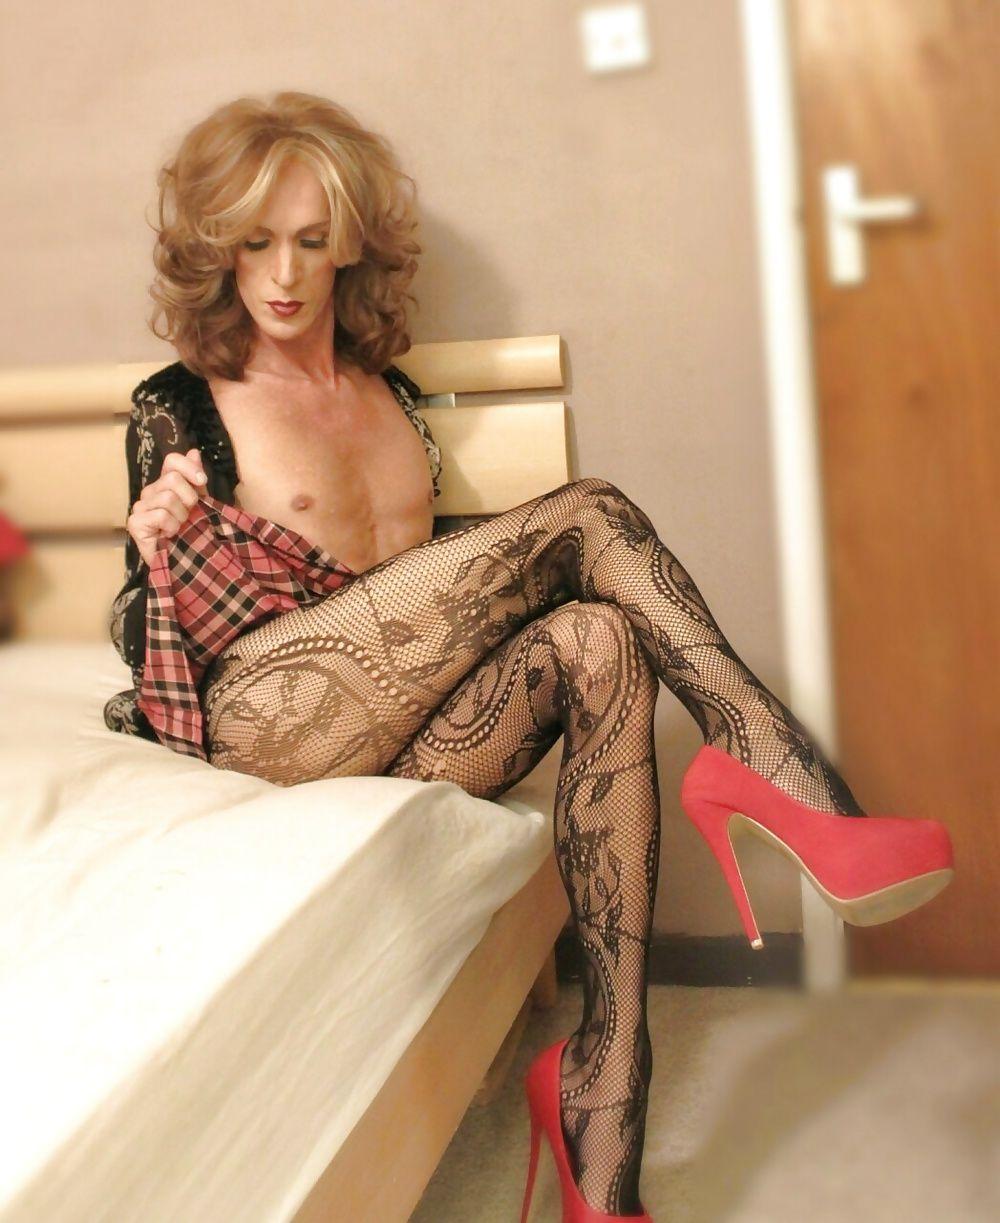 love her pantyhose! | mature transwoman | pinterest | crossdressers